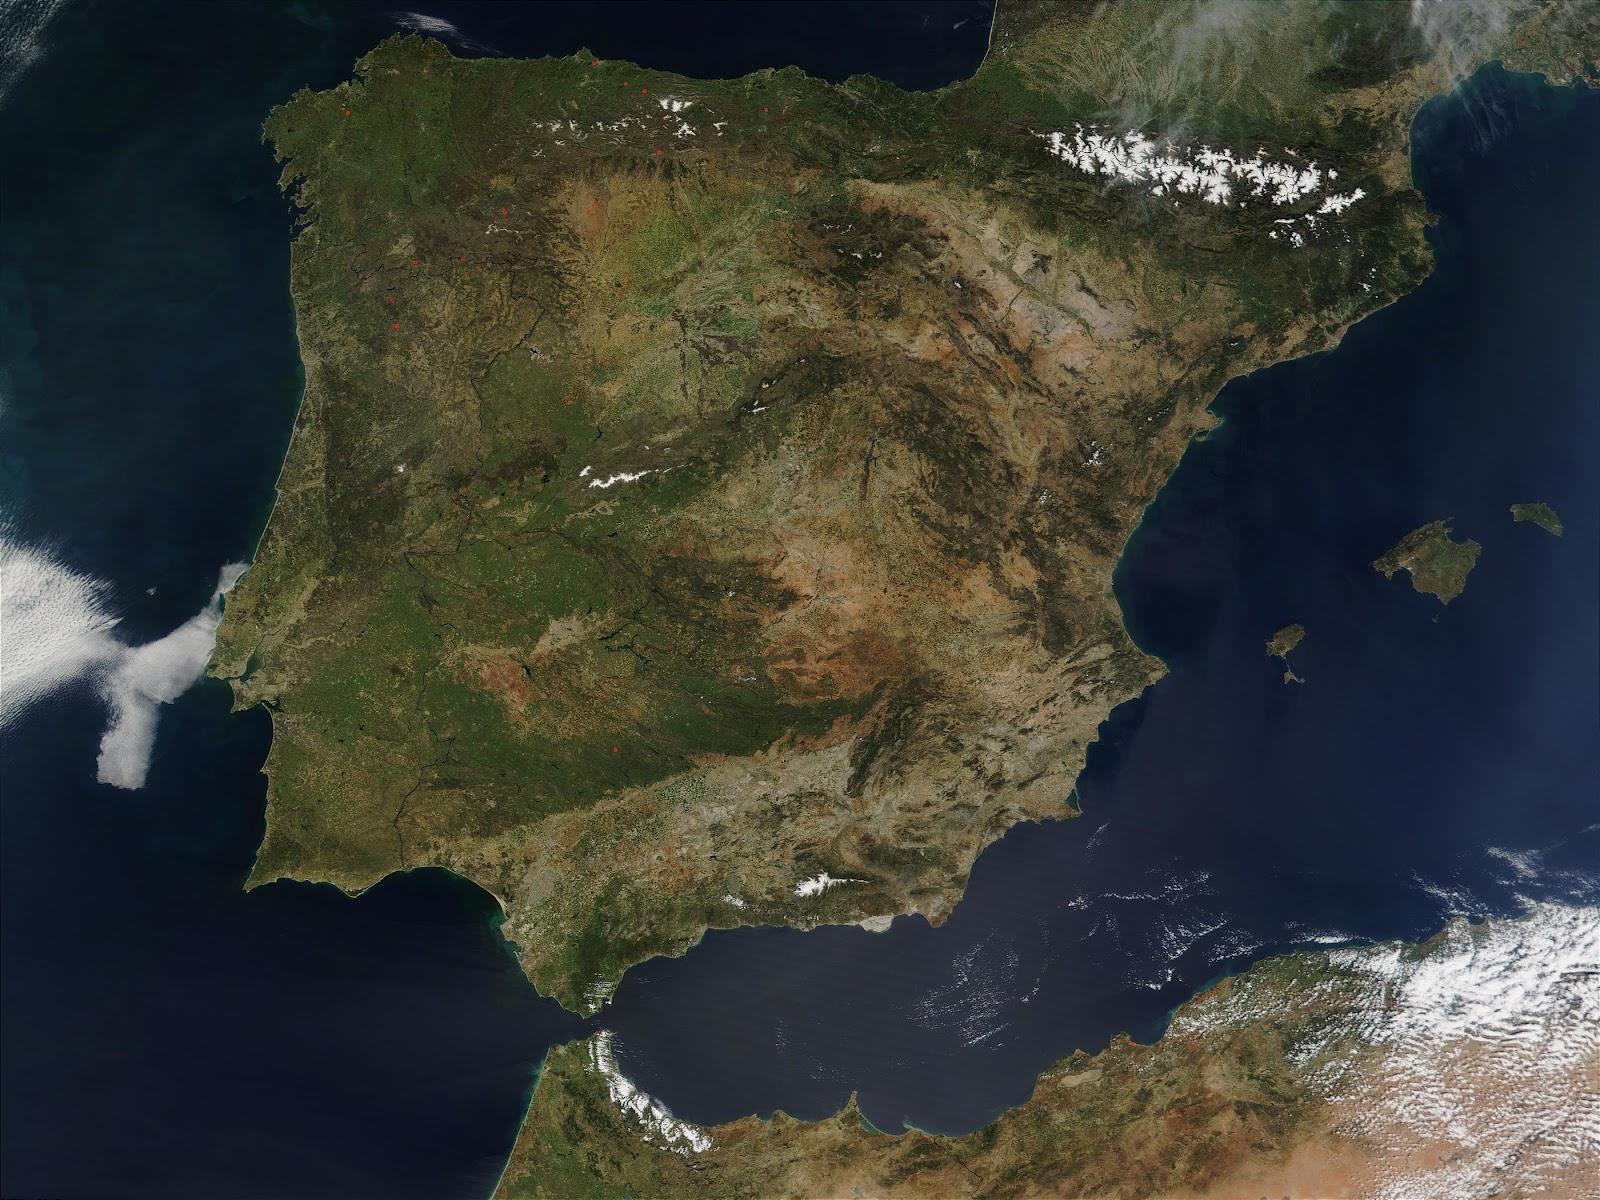 espana virtual: